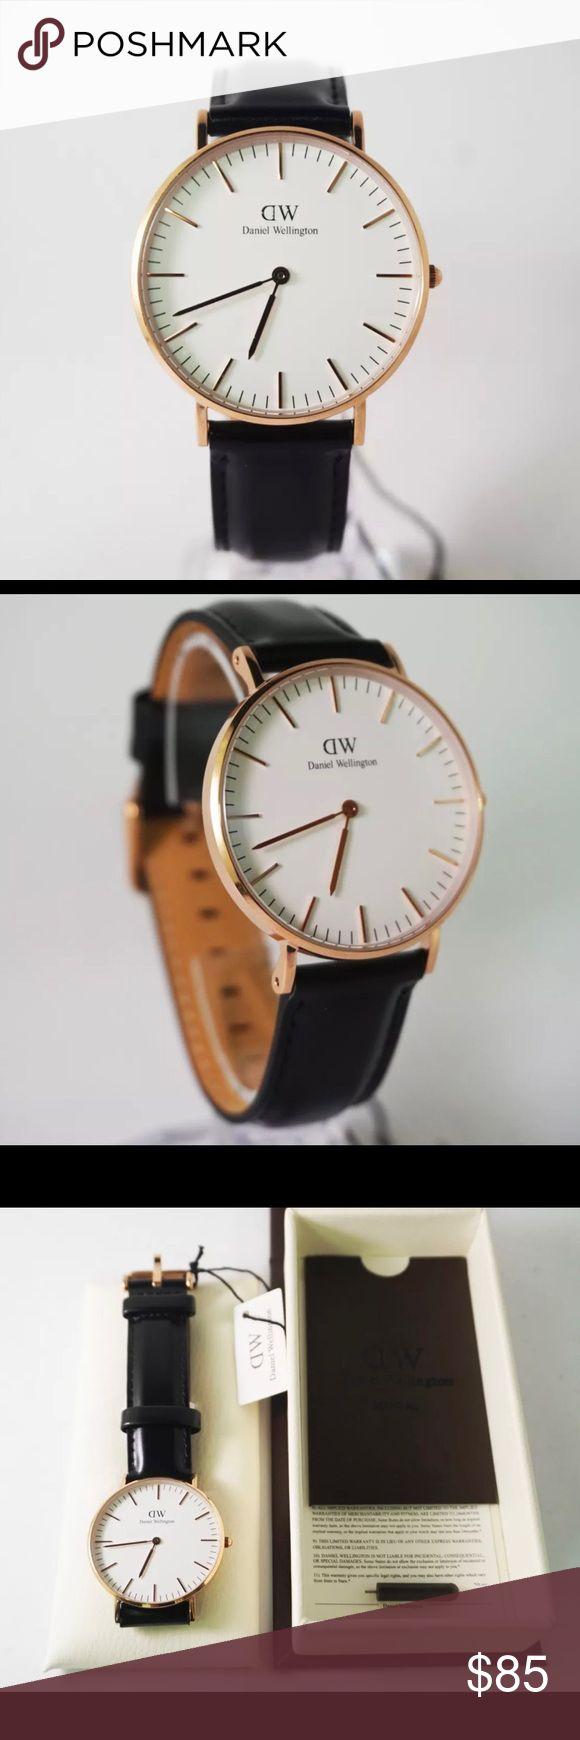 ❗️SALE❗️DANIEL WELLINGTON CLASSIC BROWN WATCH 36mm BRAND NEW 36mm Black and Rose Gold Daniel Wellington Accessories Watches